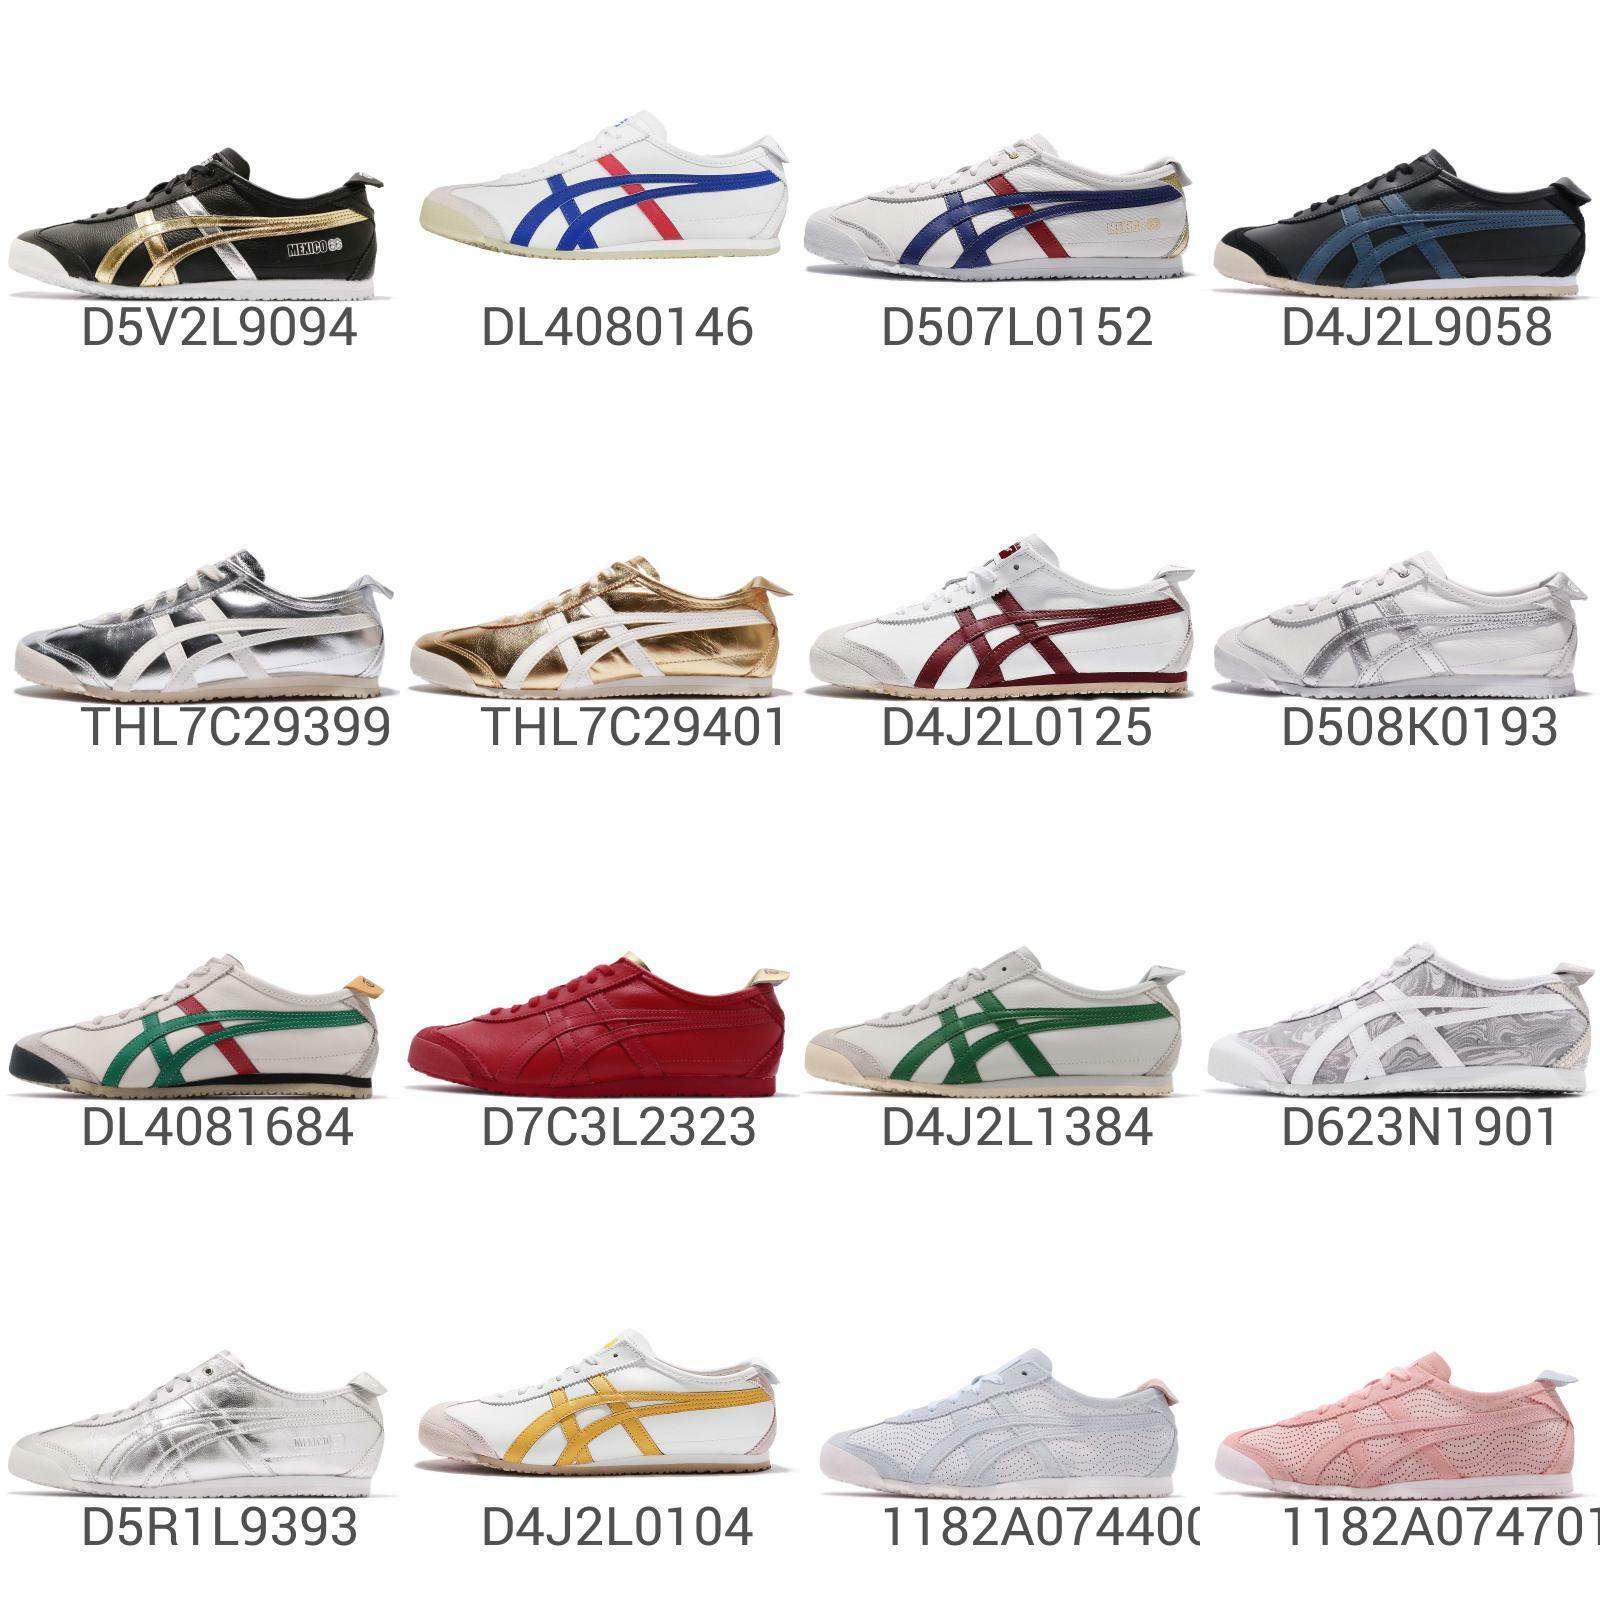 Asics Onitsuka Tiger Mexico 66 Men mujer Vintage Running zapatos zapatillas Pick 1